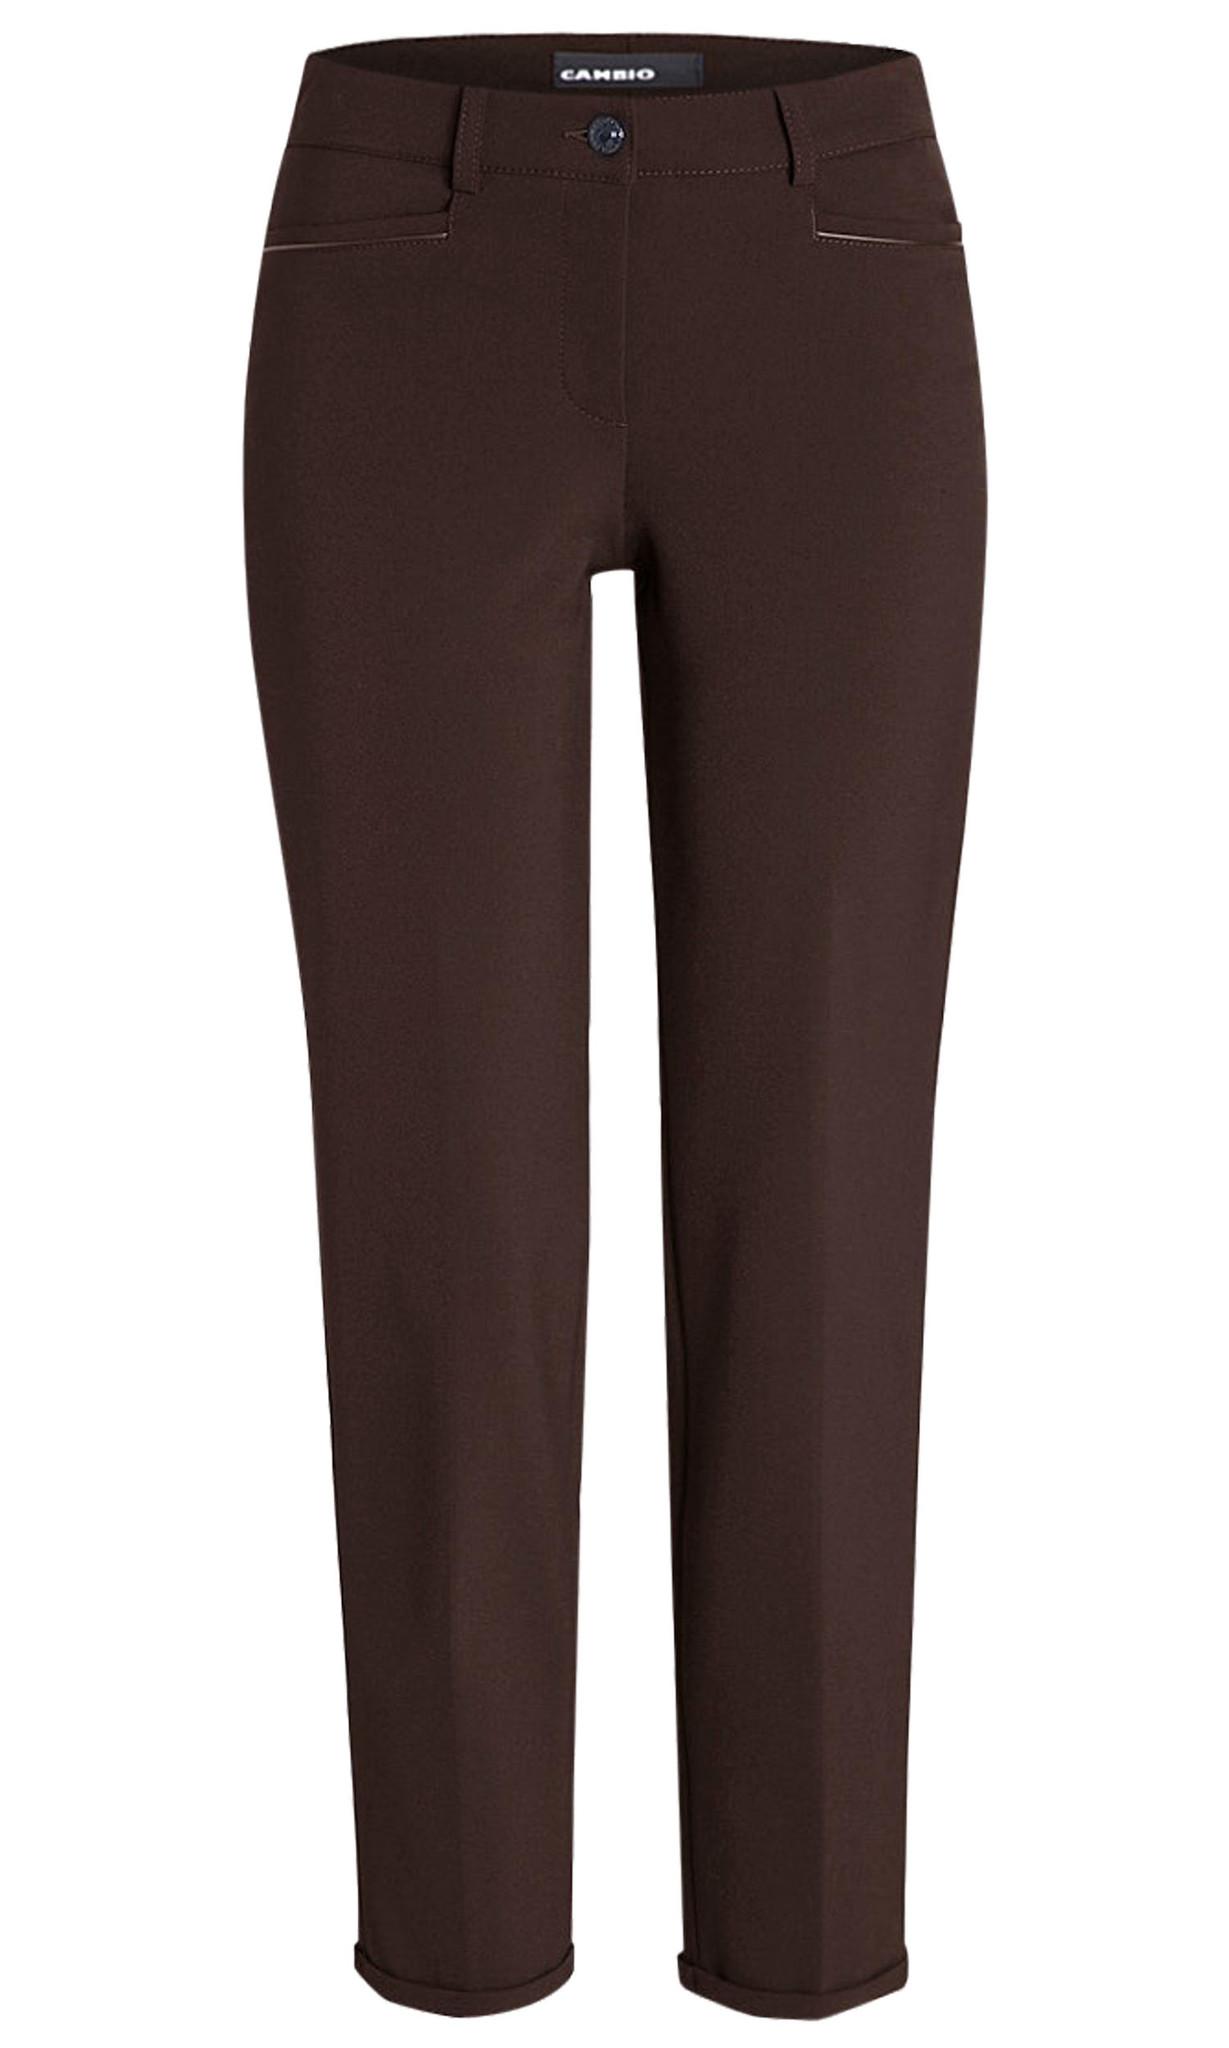 CAMBIO pantalon renira 785-1